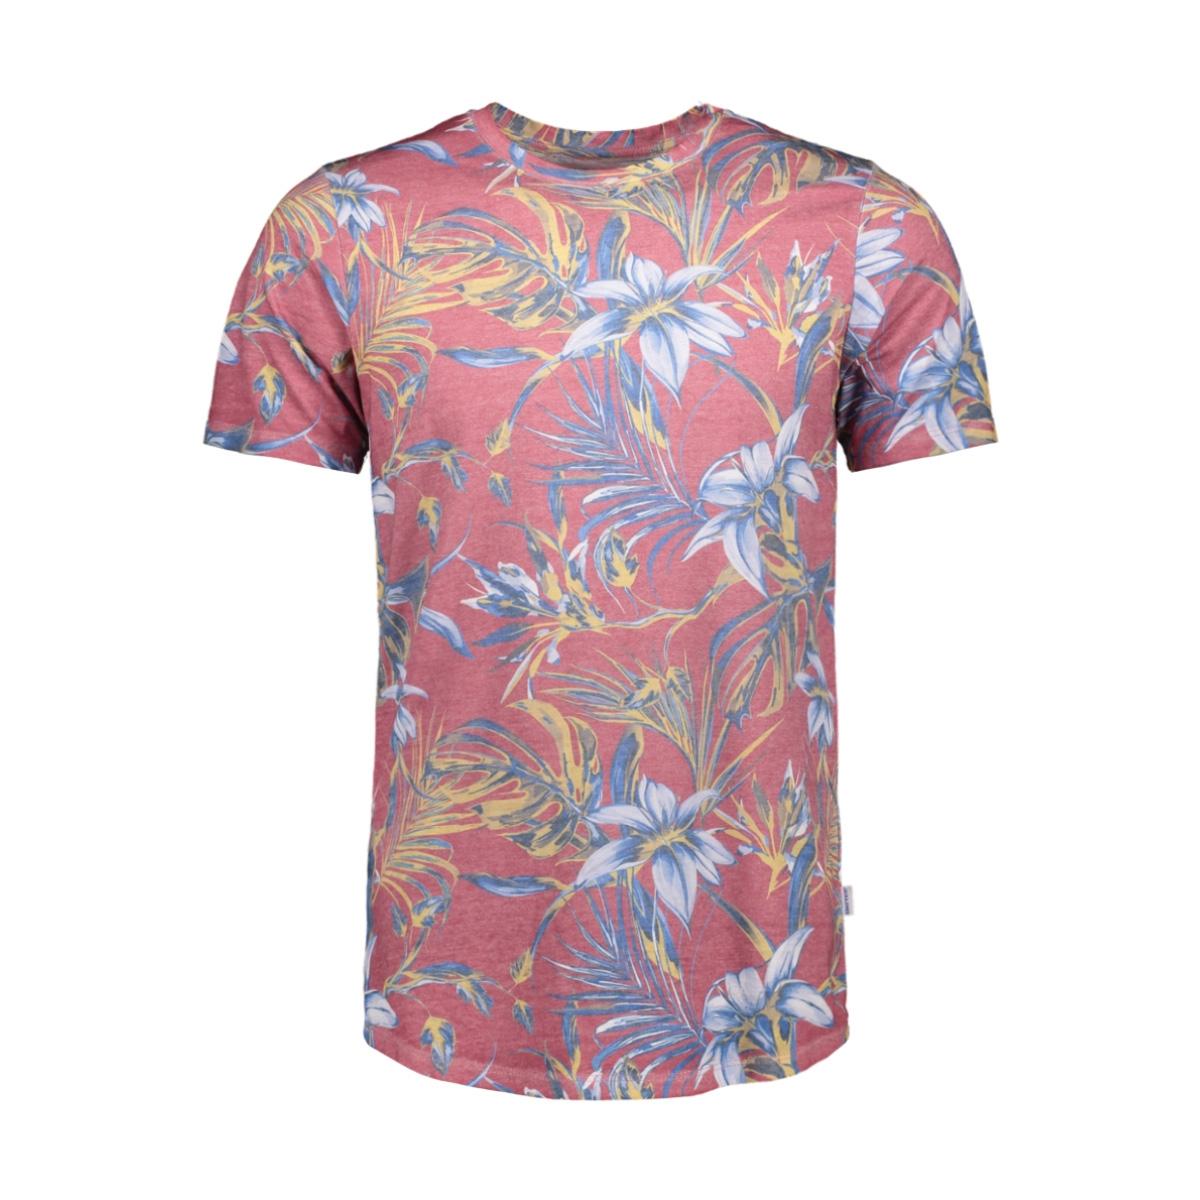 jorzeq tee ss crew neck 12155556 jack & jones t-shirt brick red/slim